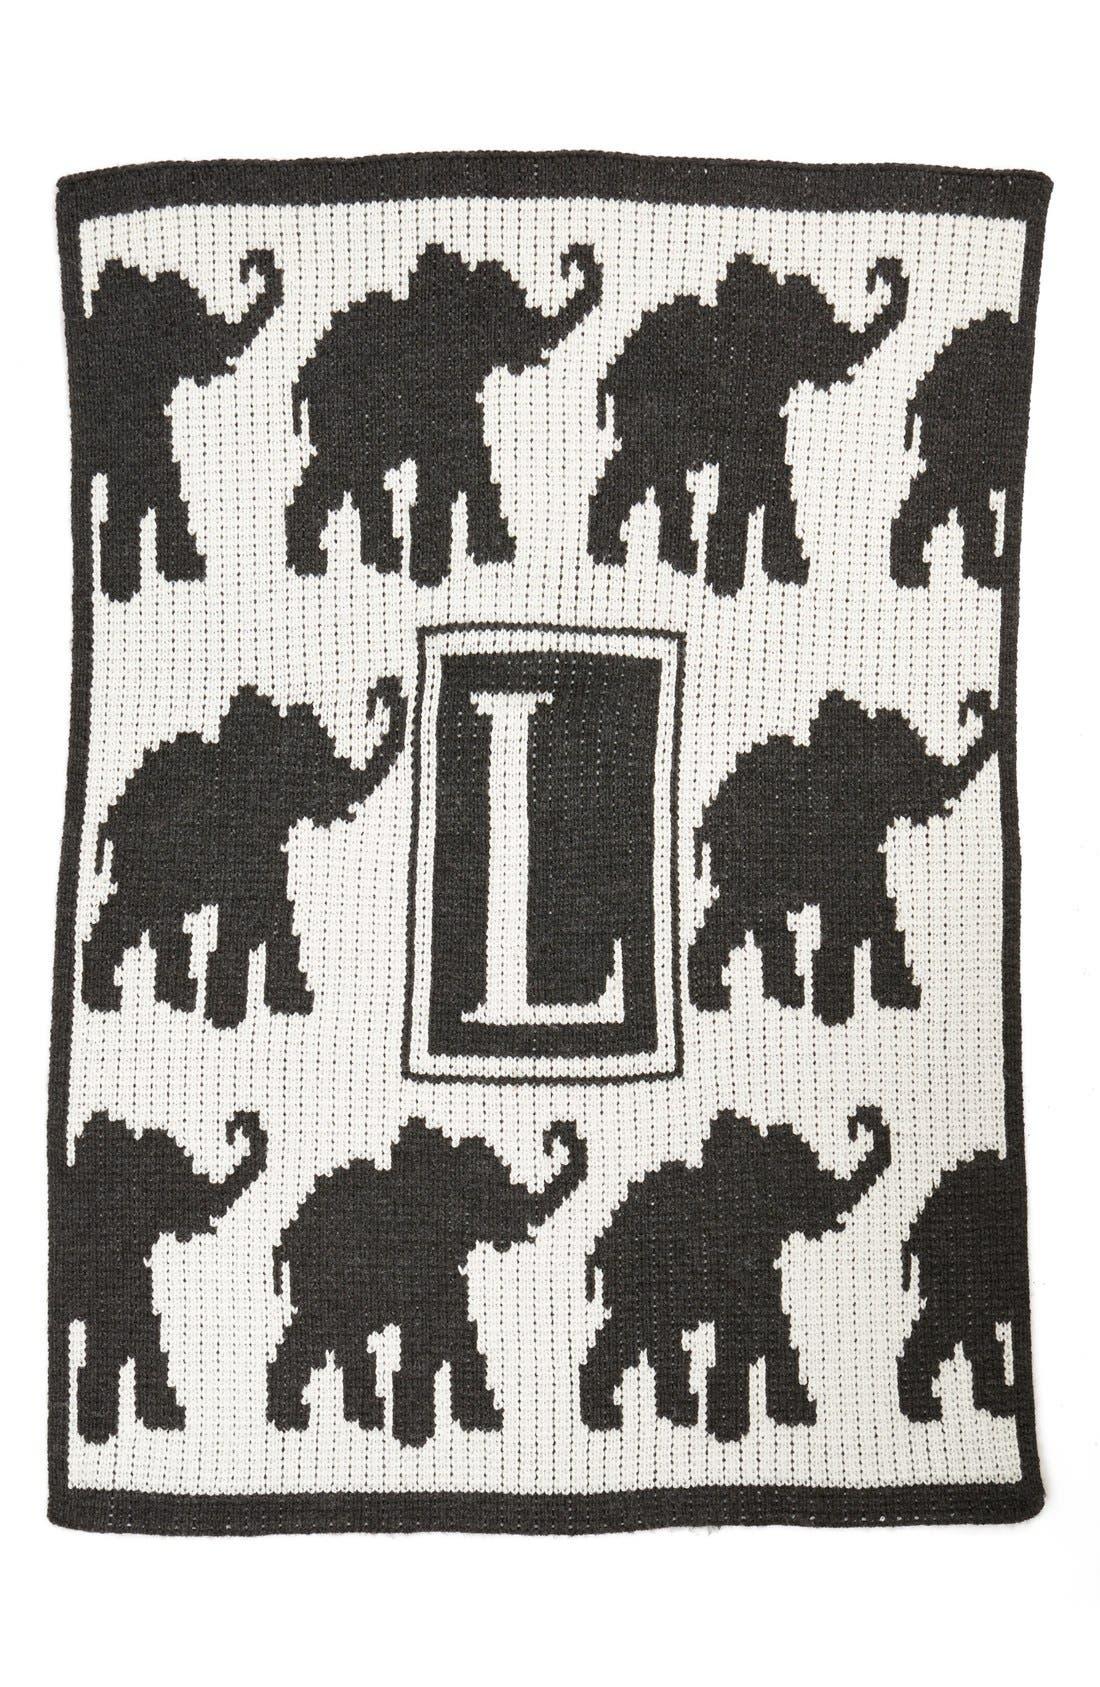 'Walking Elephants' Personalized Crib Blanket,                             Main thumbnail 1, color,                             020